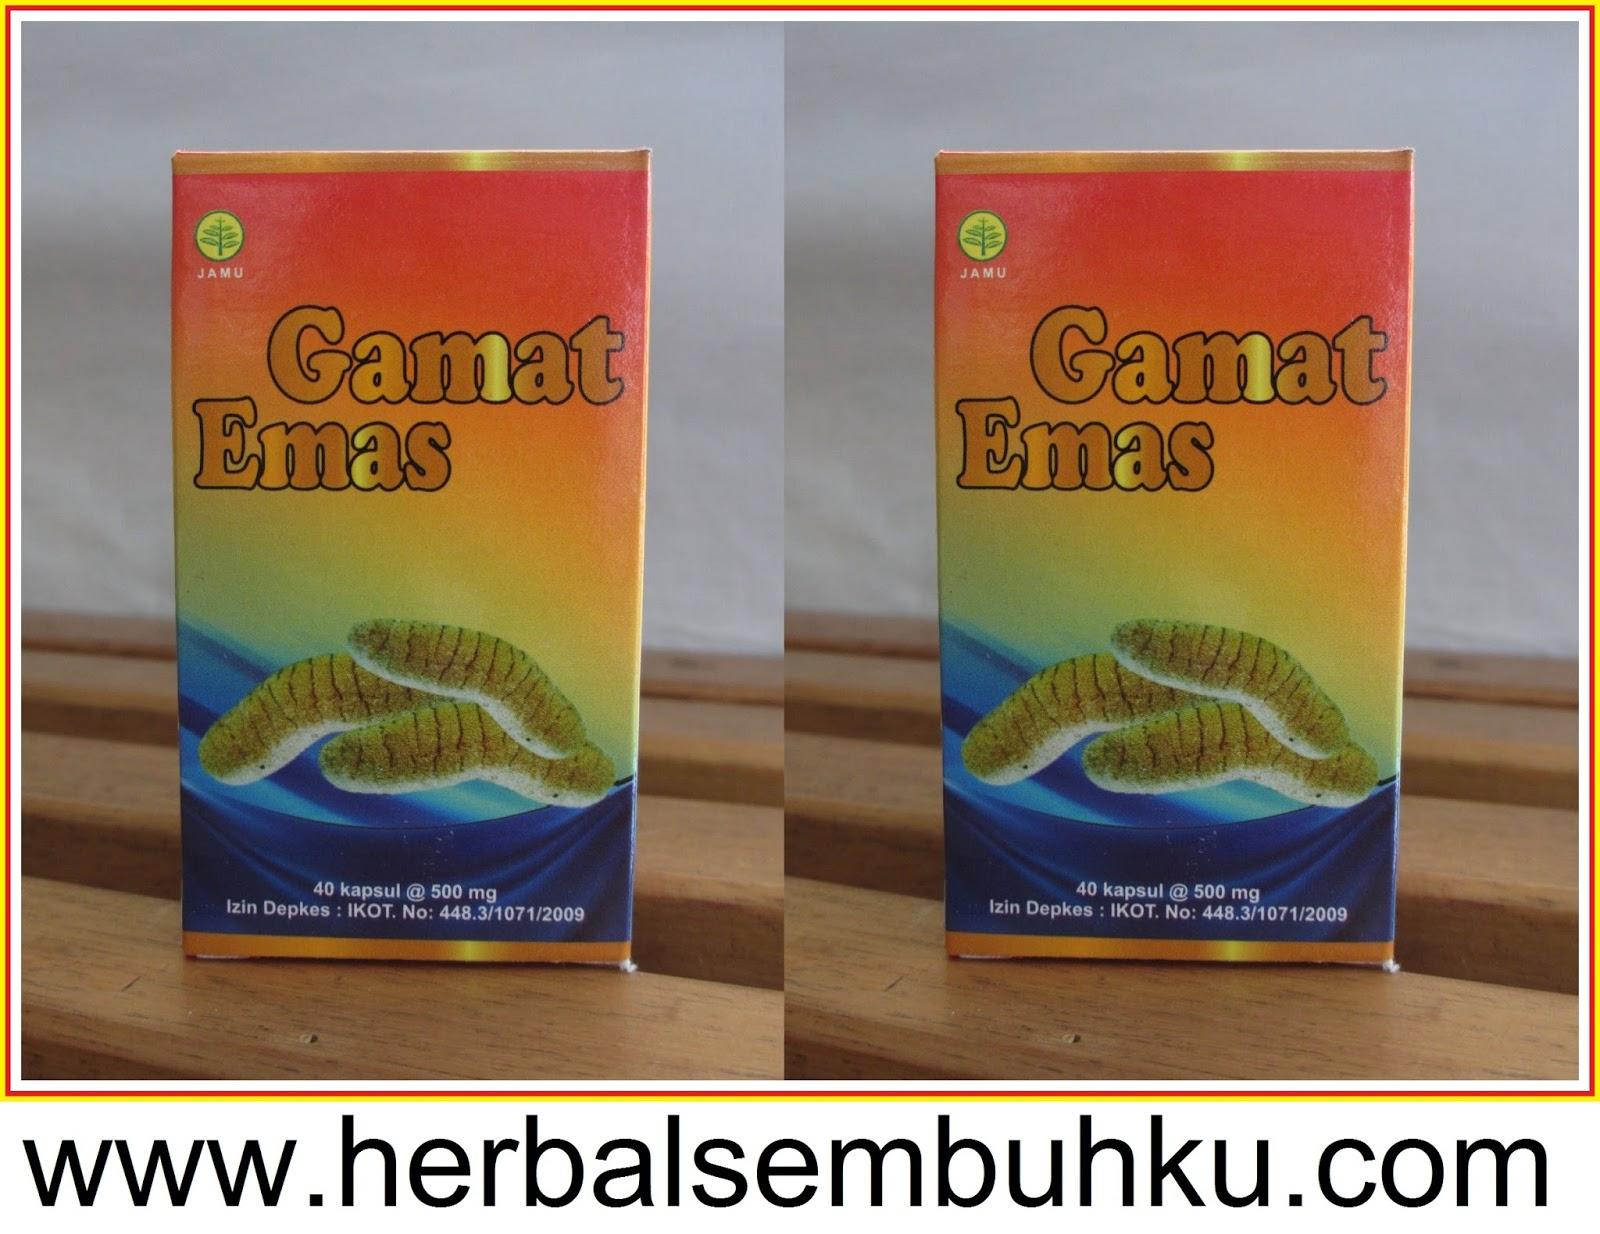 gamat emas kapsul gamat murah surabaya 085755201000 jual kapsul gamat emas herbal insani